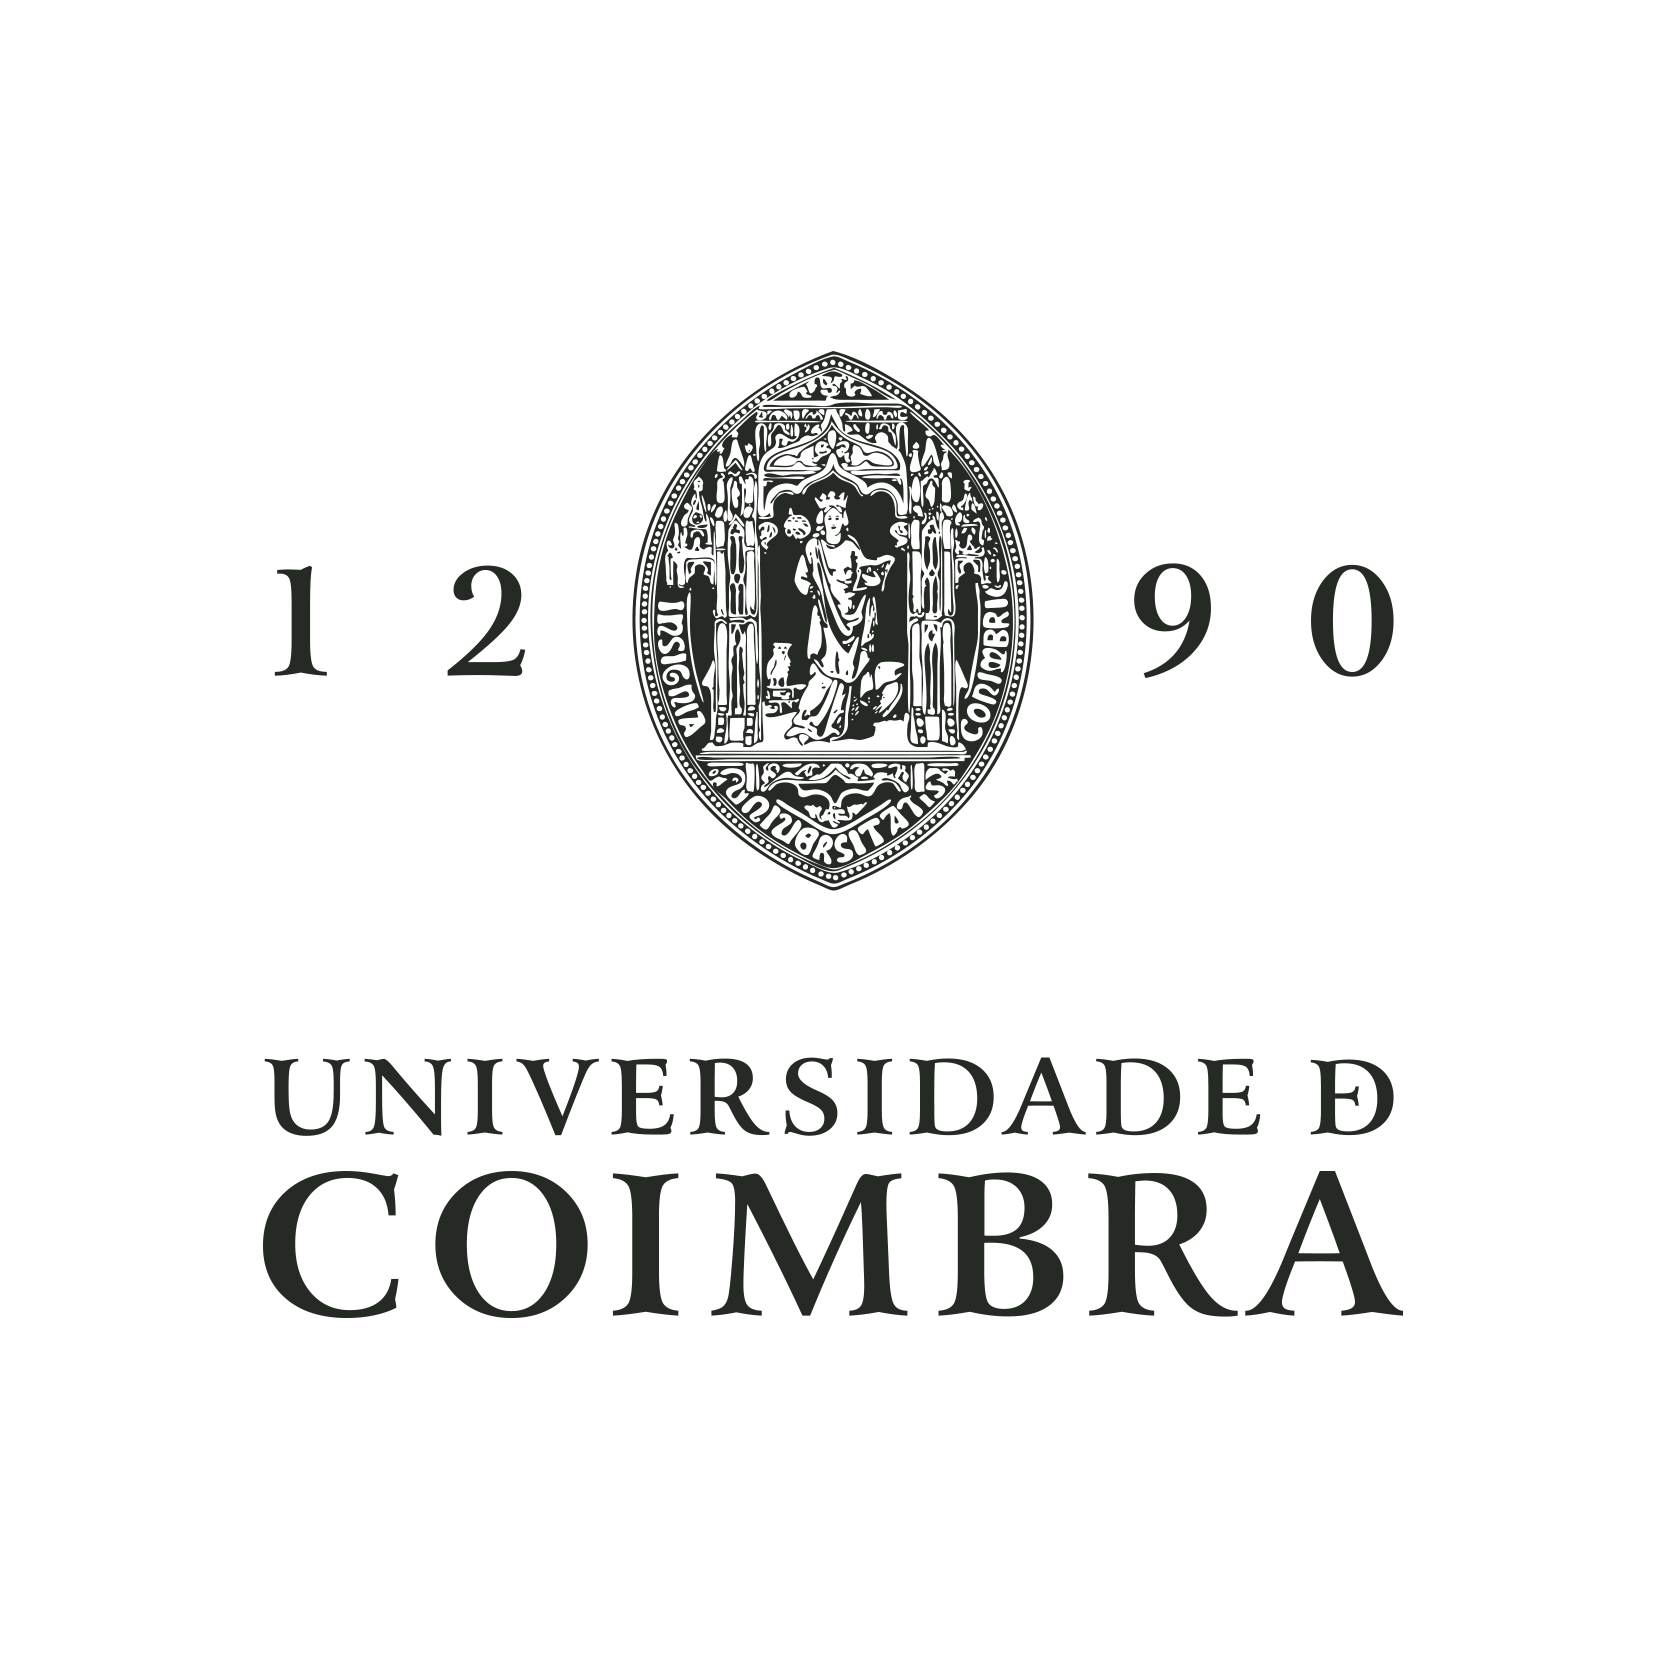 https://europeanplasticspact.org/wp-content/uploads/2020/03/University-of-Coimbra.png